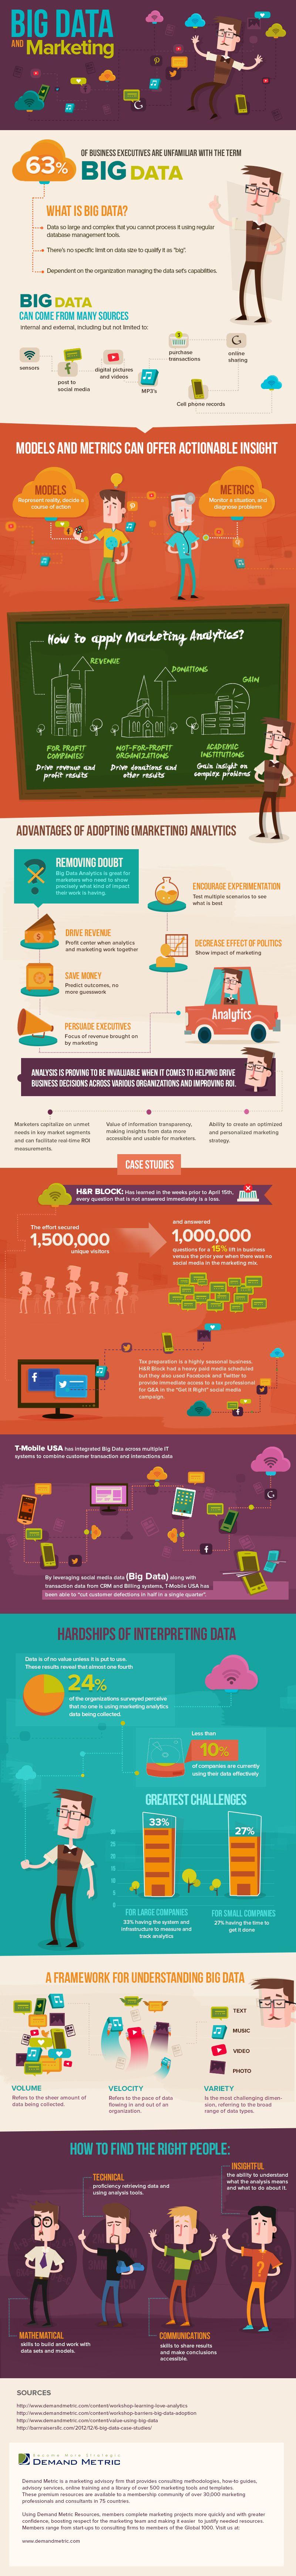 Bluehost Com Big Data Marketing Infographic Marketing Big Data